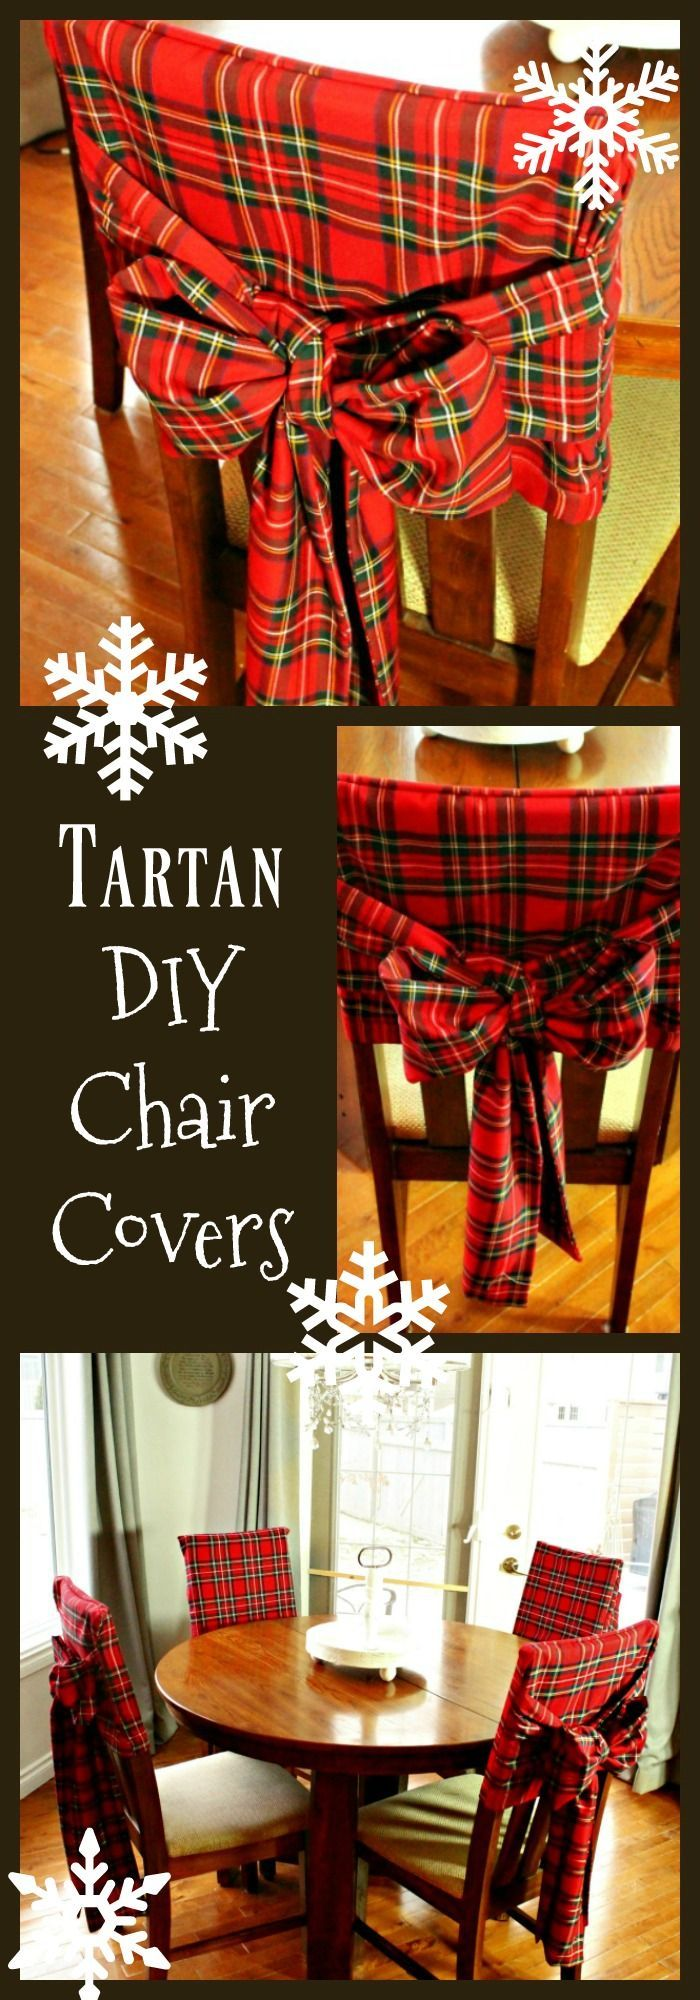 Diy christmas chair covers - Diy Christmas Tartan Chair Covers